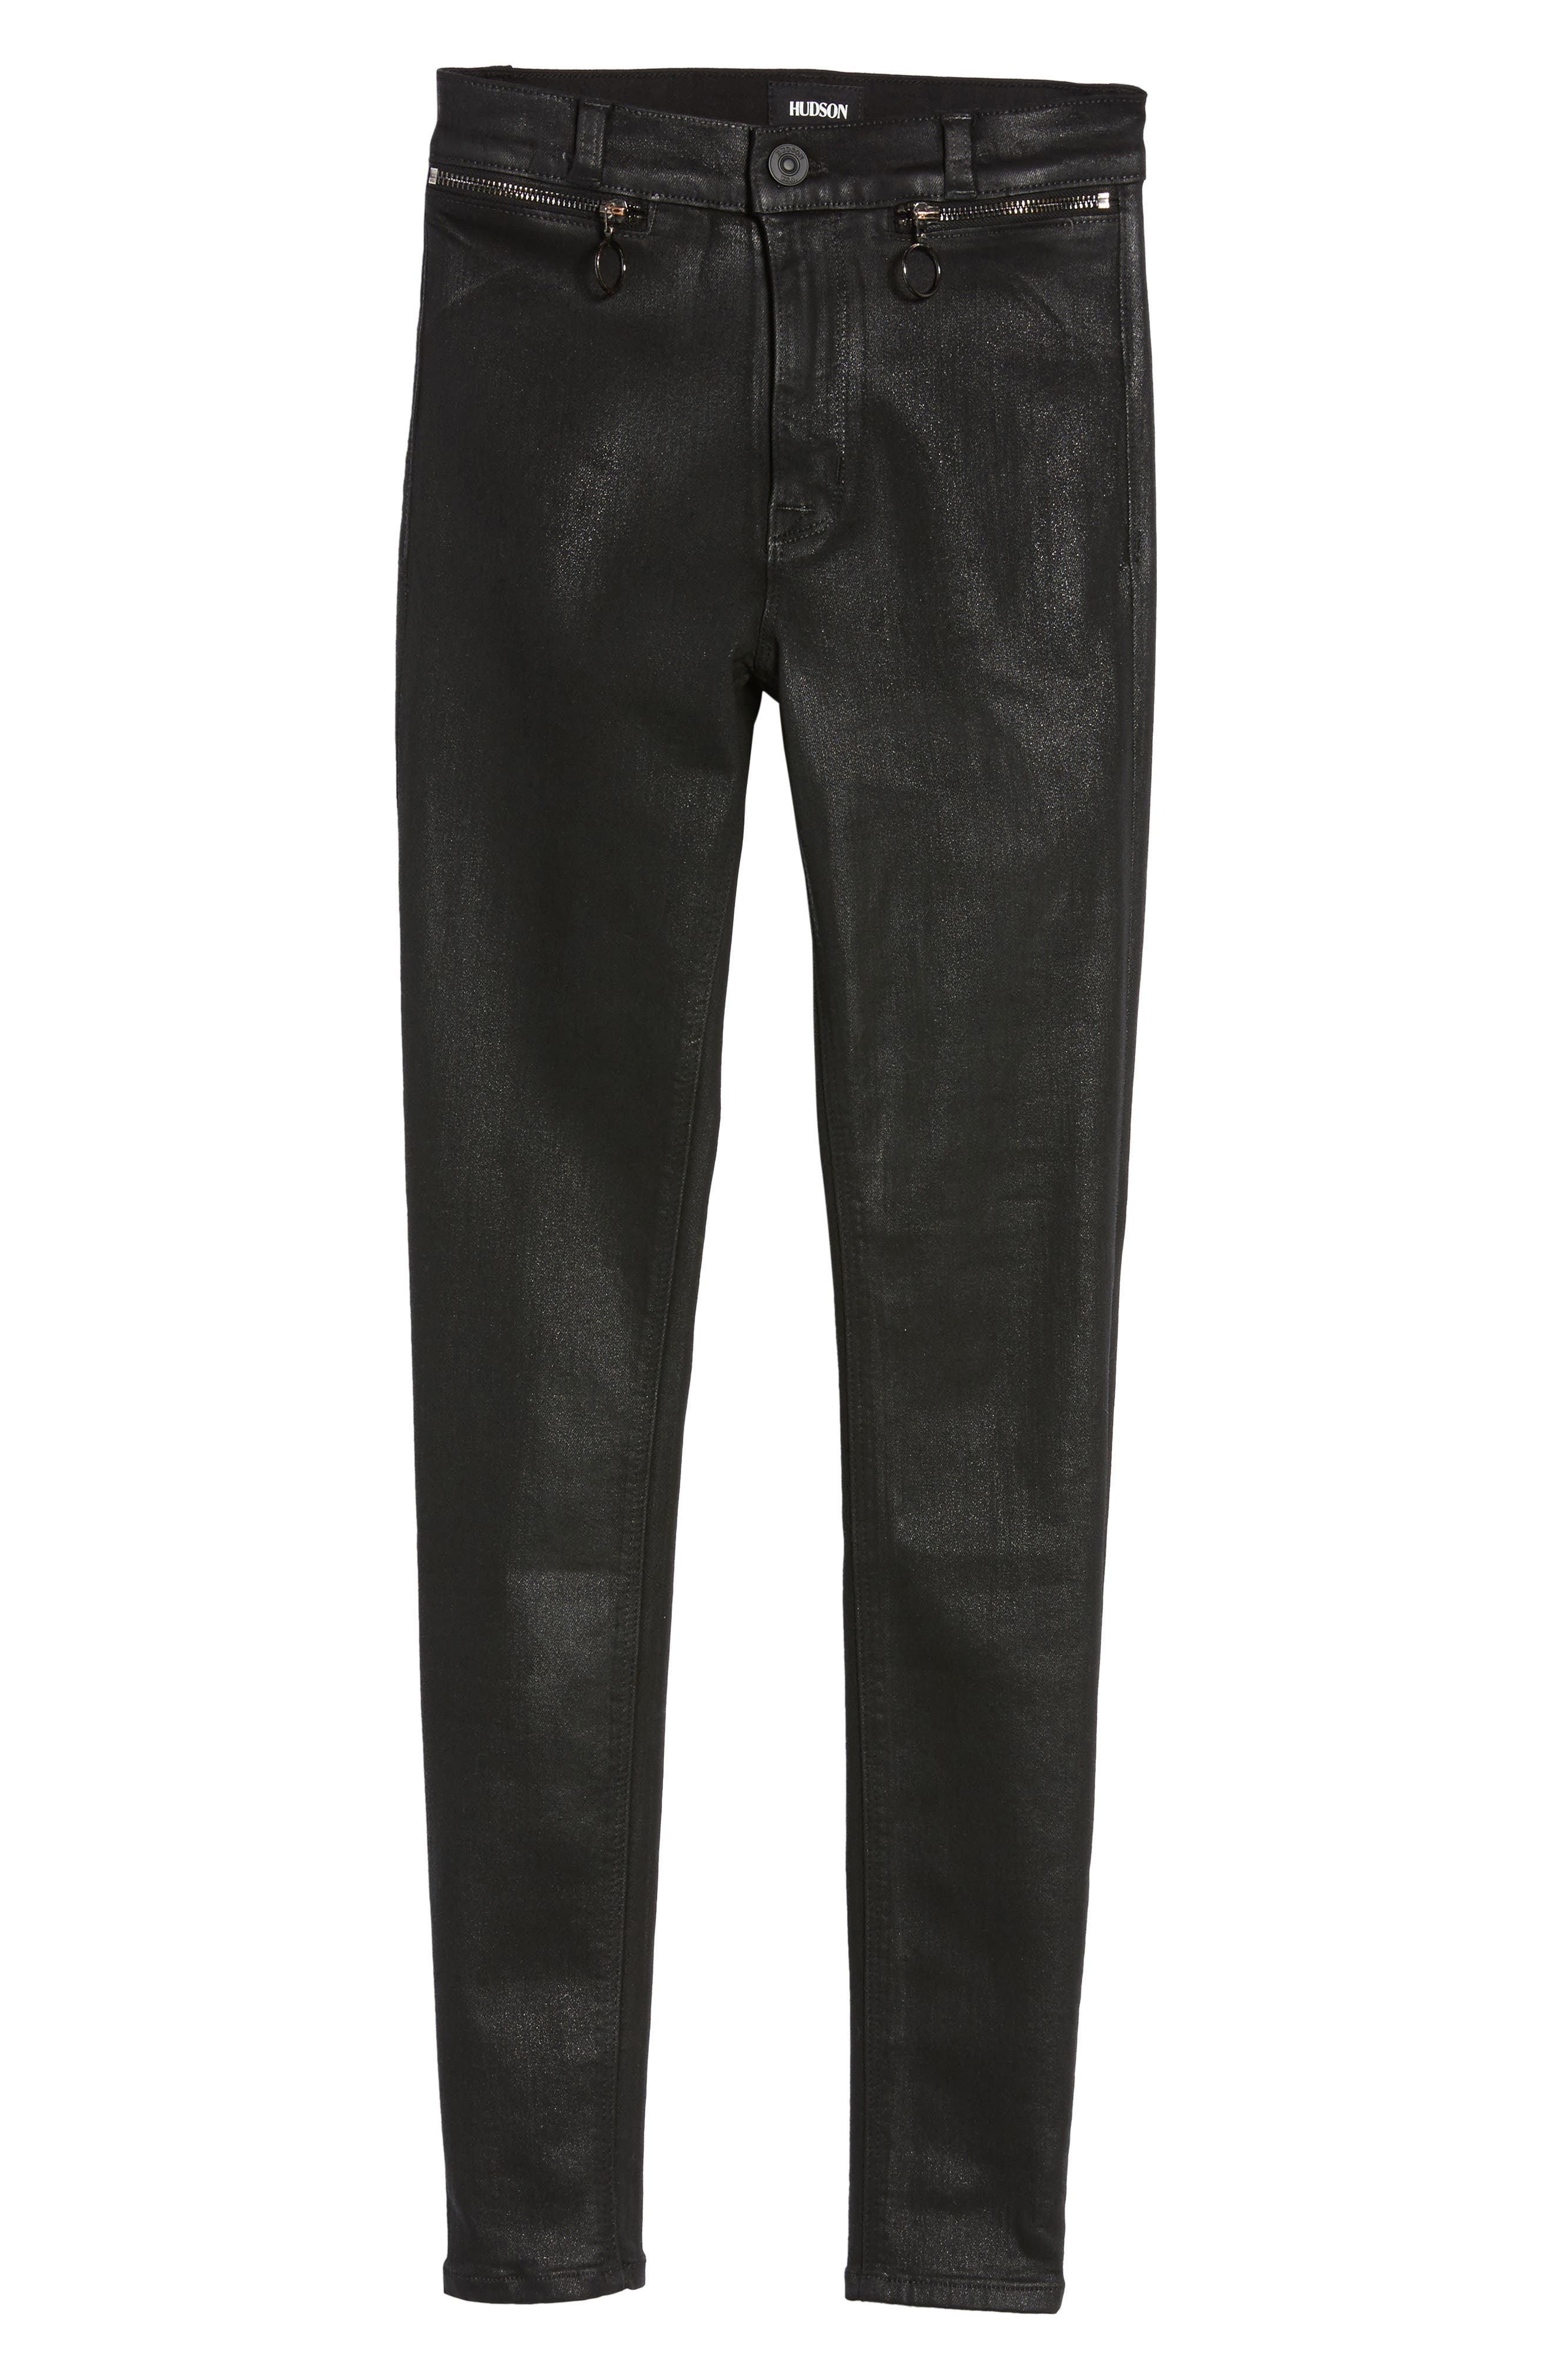 Kooper Coated Skinny Jeans,                             Alternate thumbnail 6, color,                             Black Coated